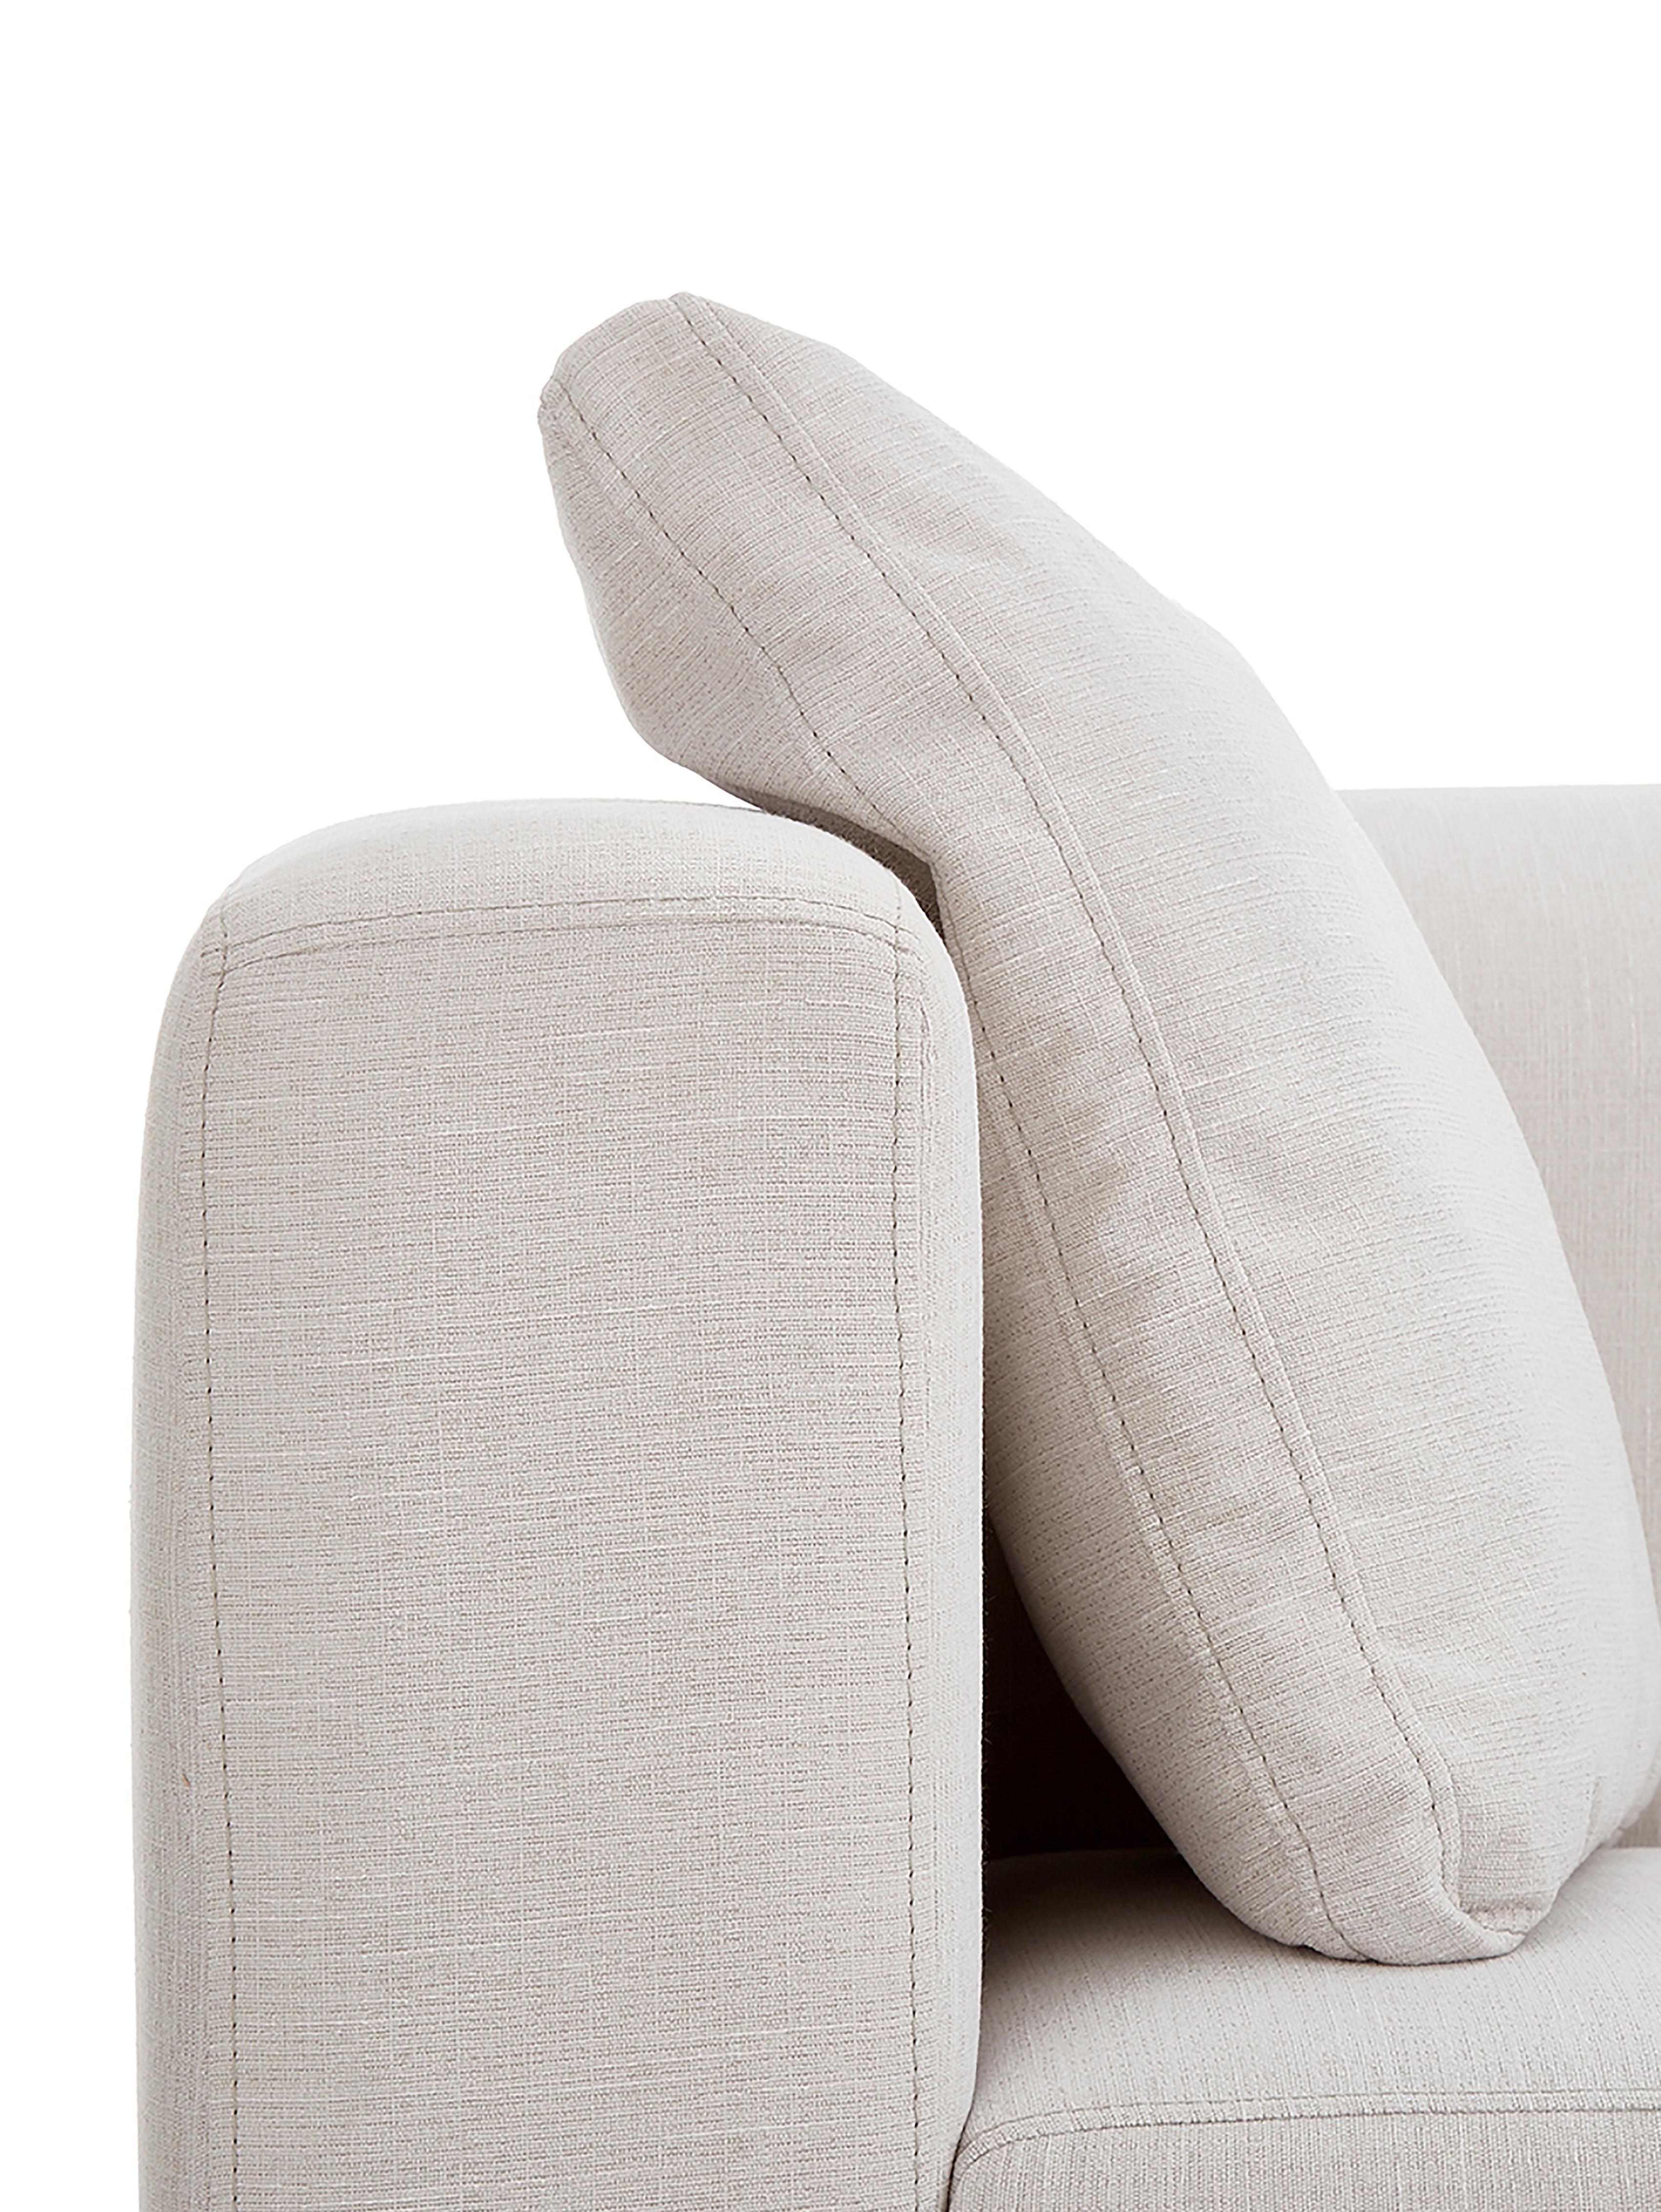 Sofa Carrie (2-Sitzer), Bezug: Polyester 50.000 Scheuert, Gestell: Spanholz, Hartfaserplatte, Füße: Metall, lackiert, Webstoff Beige, B 176 x T 86 cm